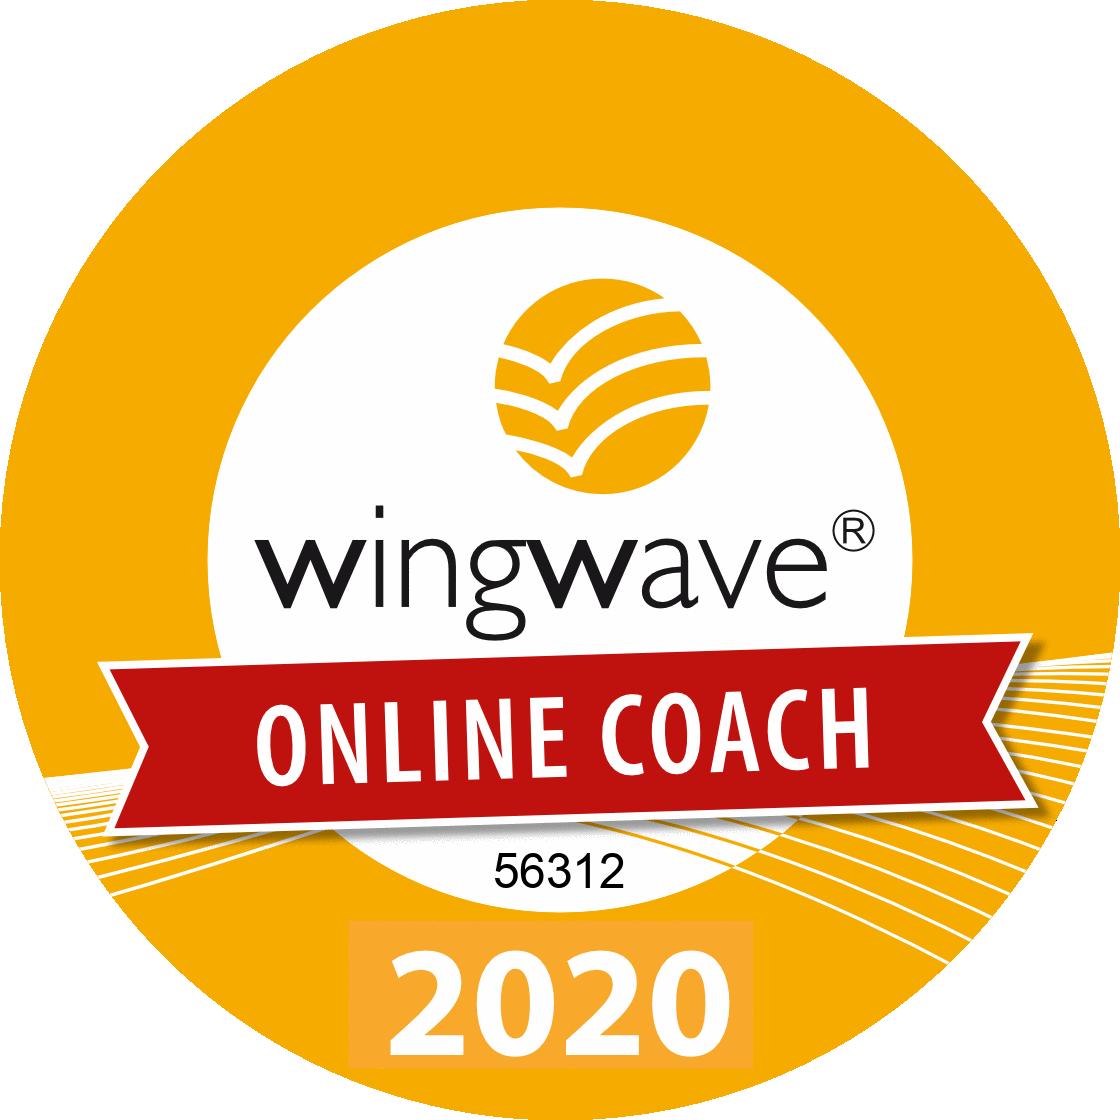 Sello de Calidad Coach wingwave®'20 Online nº 56312